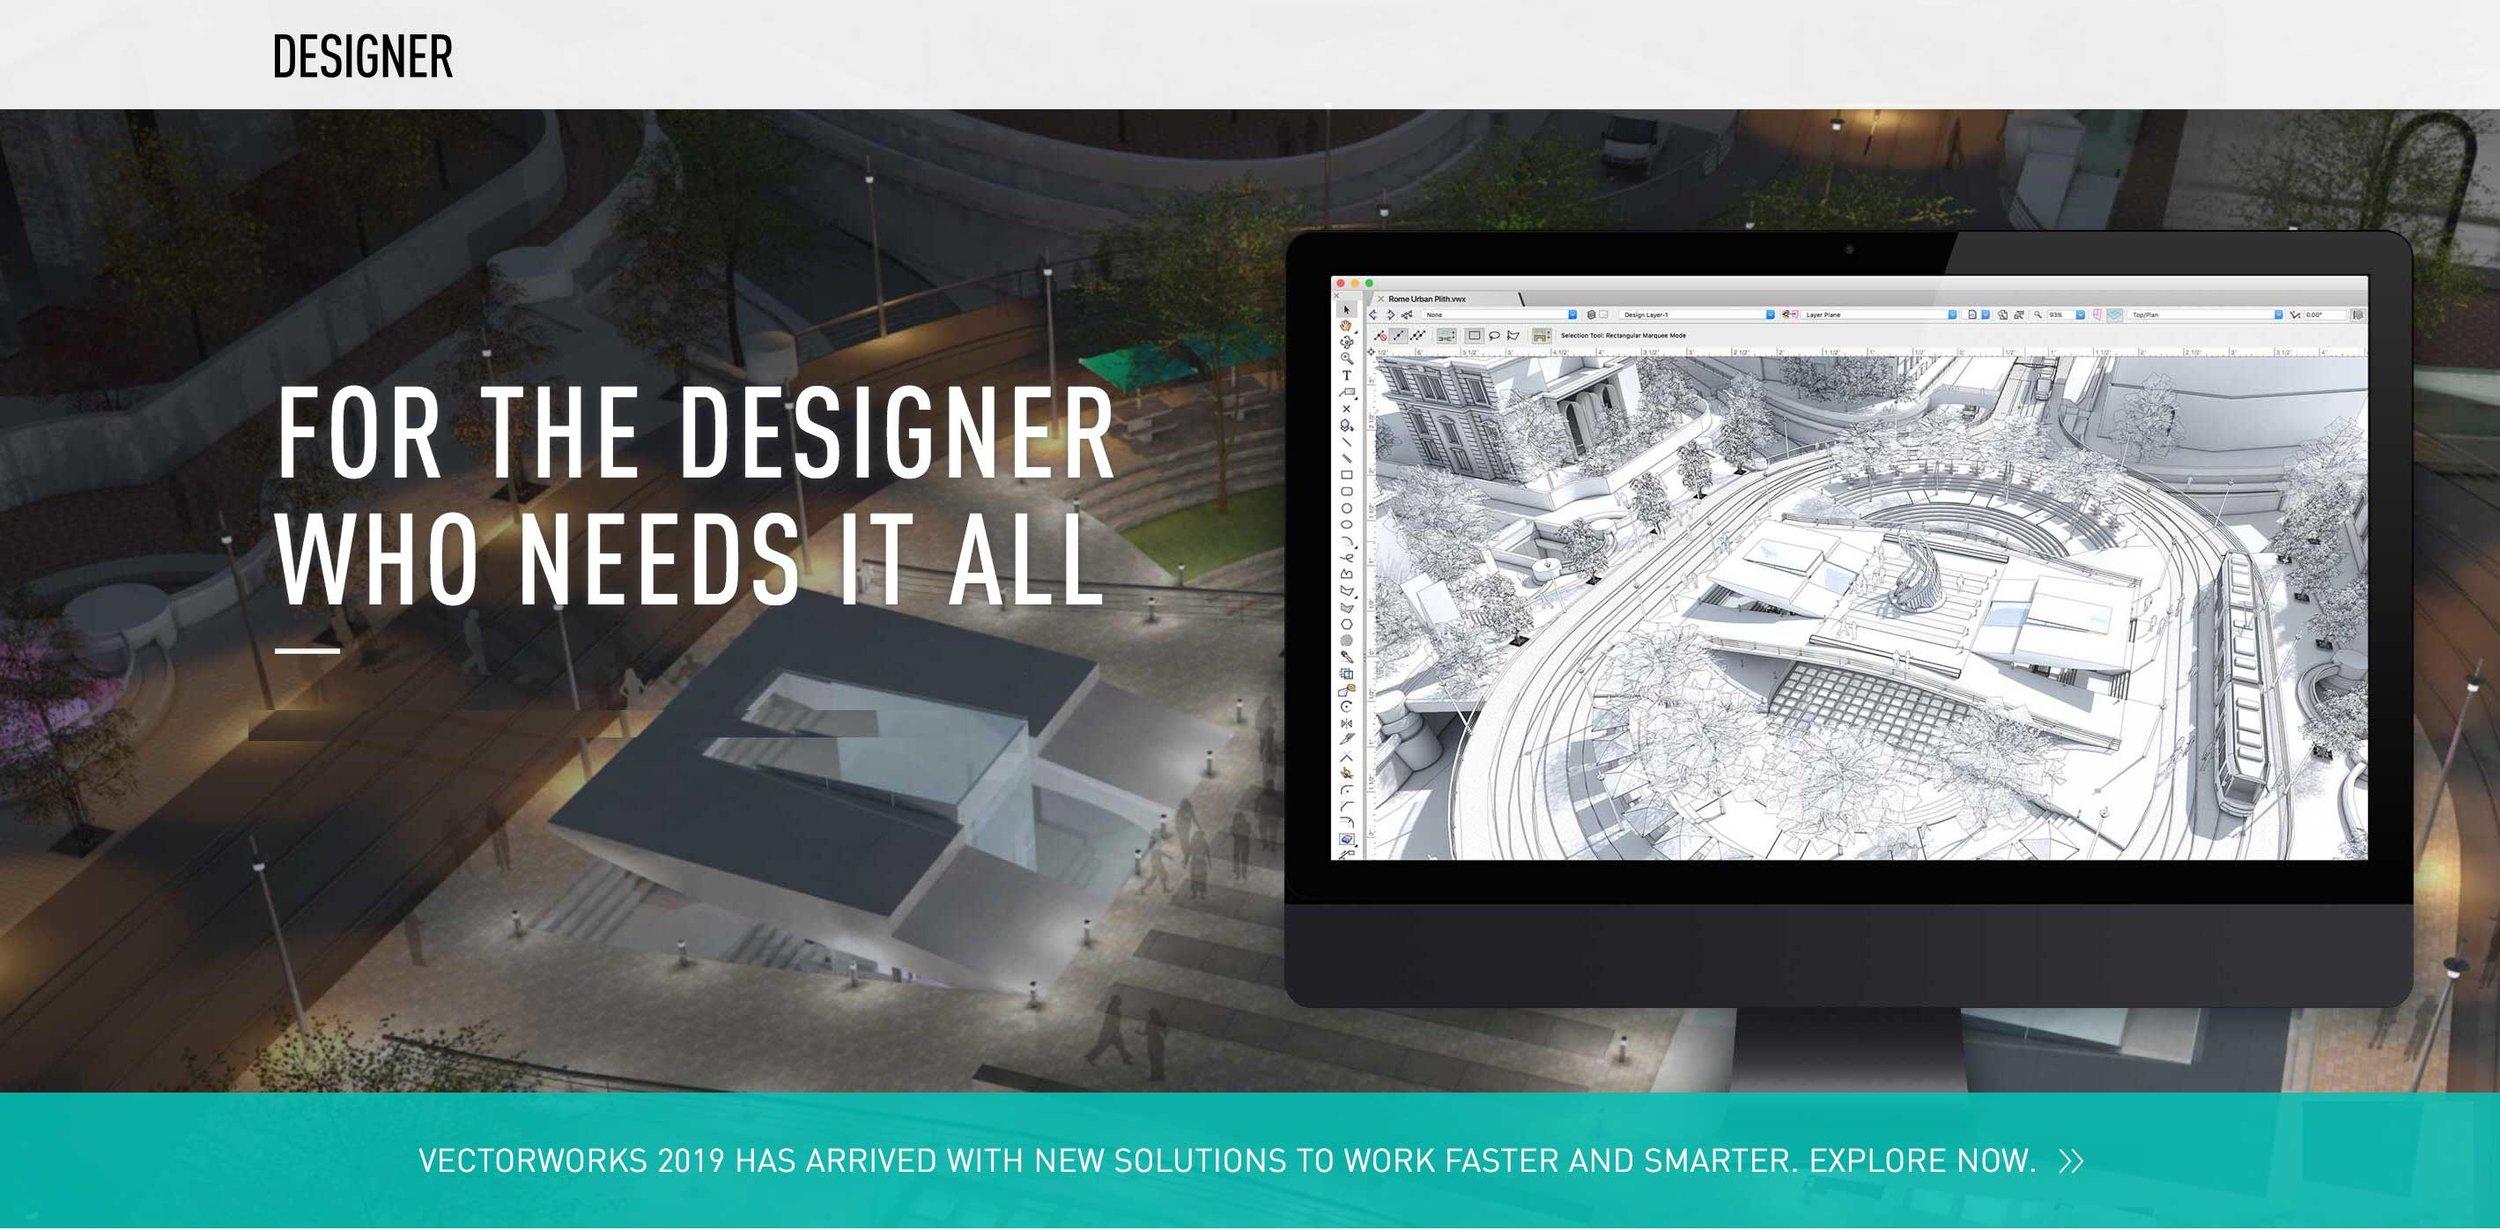 _Vectorworks_Designer___Software_Suite.jpg